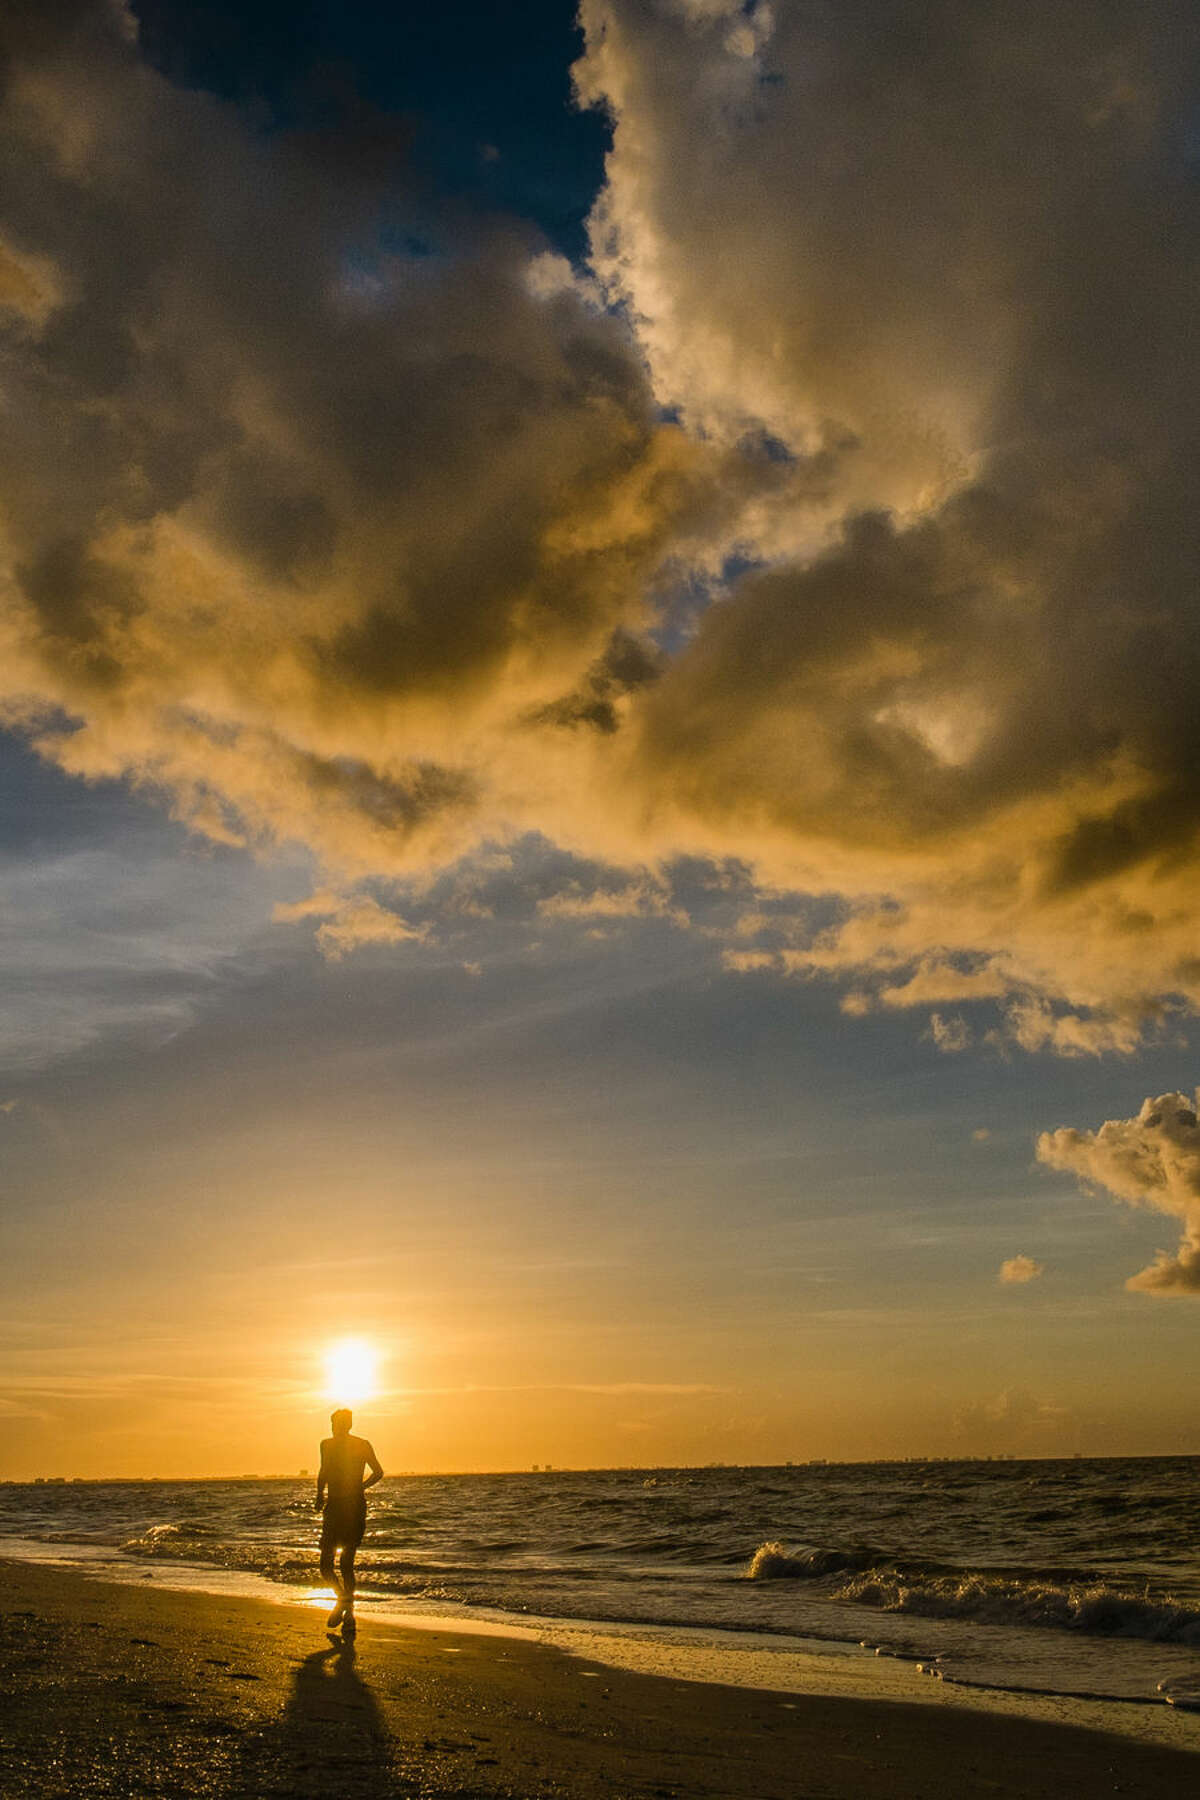 A jogger runs along the Sanibel Island, Fla. beach at daybreak in the waning days of summer Friday, Aug. 29, 2014. (AP Photo/J. David Ake)